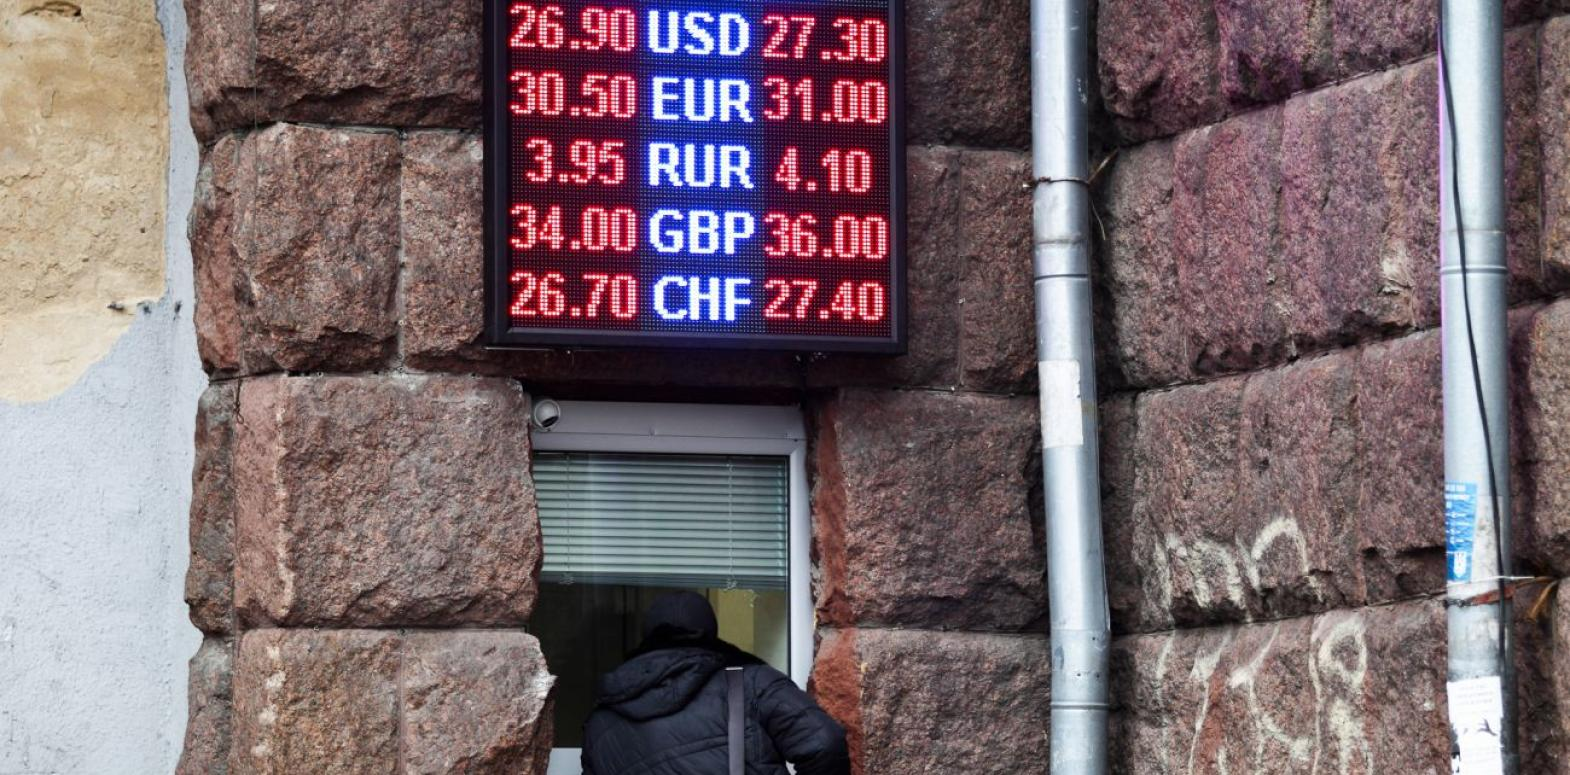 Что будет с курсом доллара: аналитик дал прогноз до конца недели